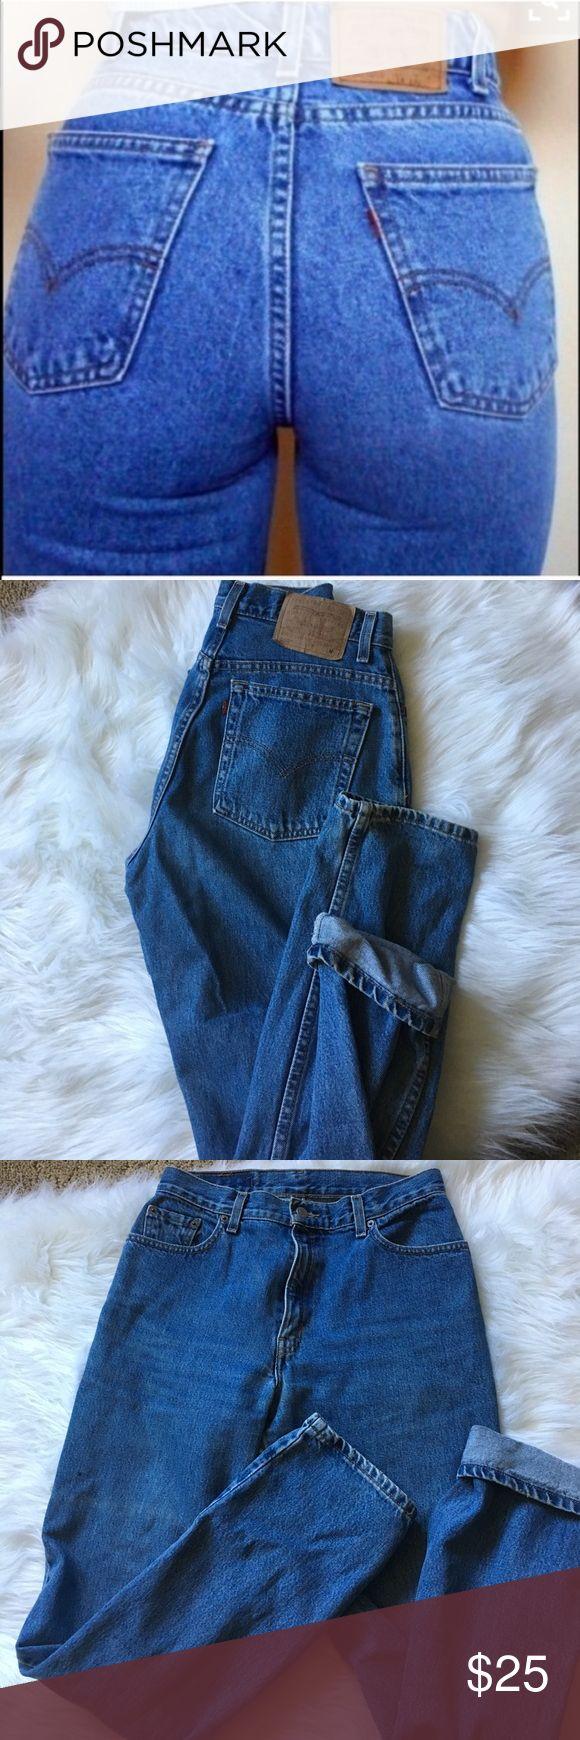 "Vintage High Waisted Levi Jeans Vintage High waisted Levi Jeans Size 4.. Measurements.. Waist- 29"", rise 12"", inseam- 29"" Levi's Jeans Boyfriend"